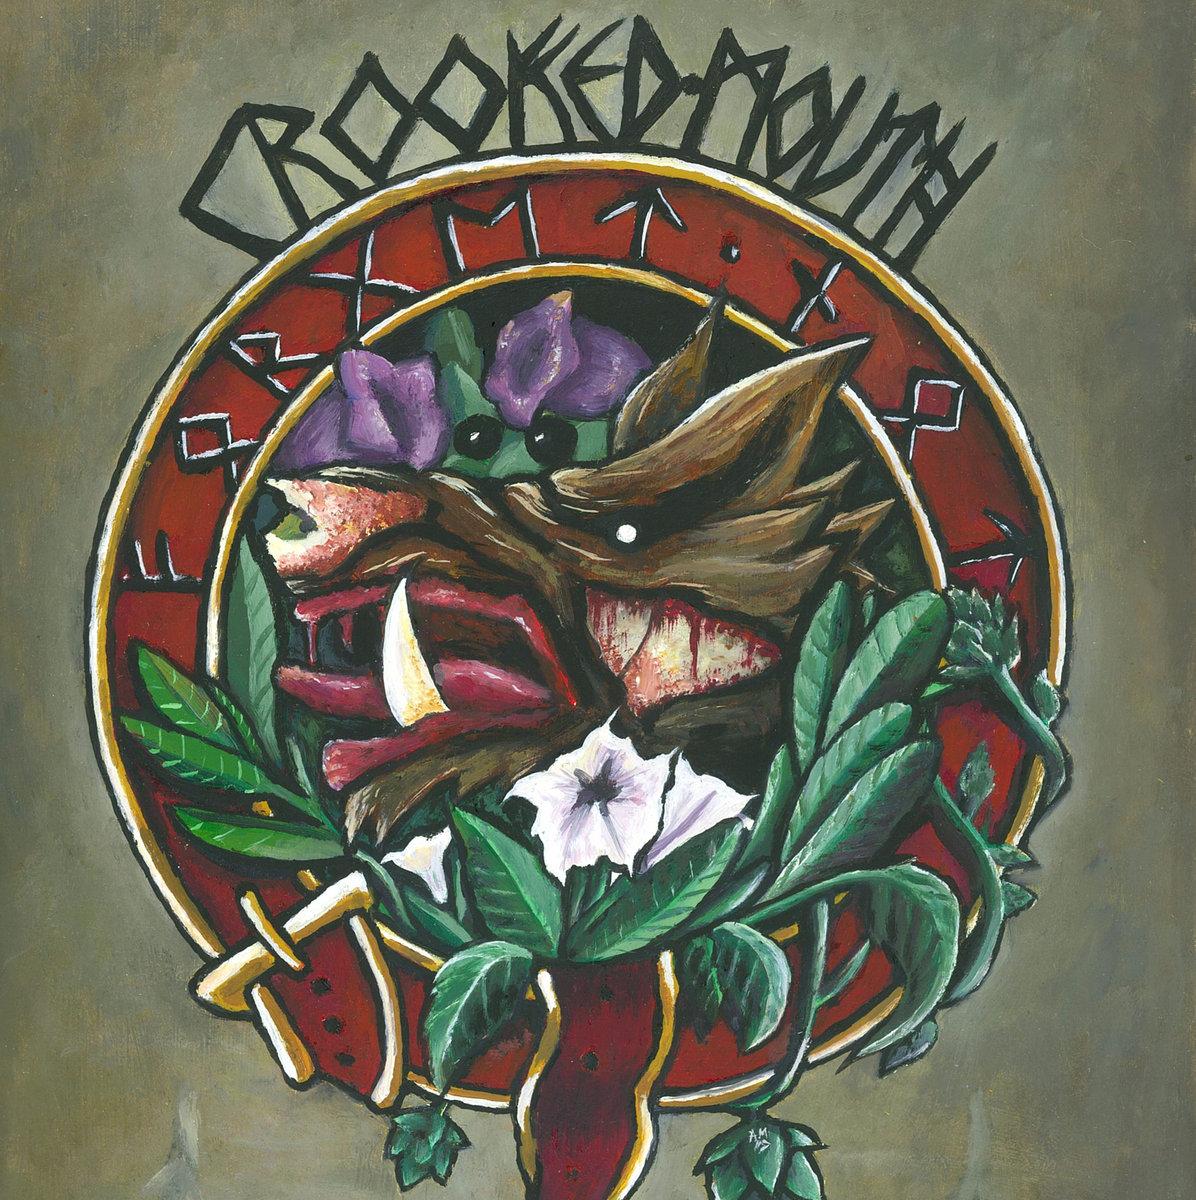 Nine Doors Open  sc 1 st  Crooked Mouth - Bandc& & Nine Doors Open | Crooked Mouth